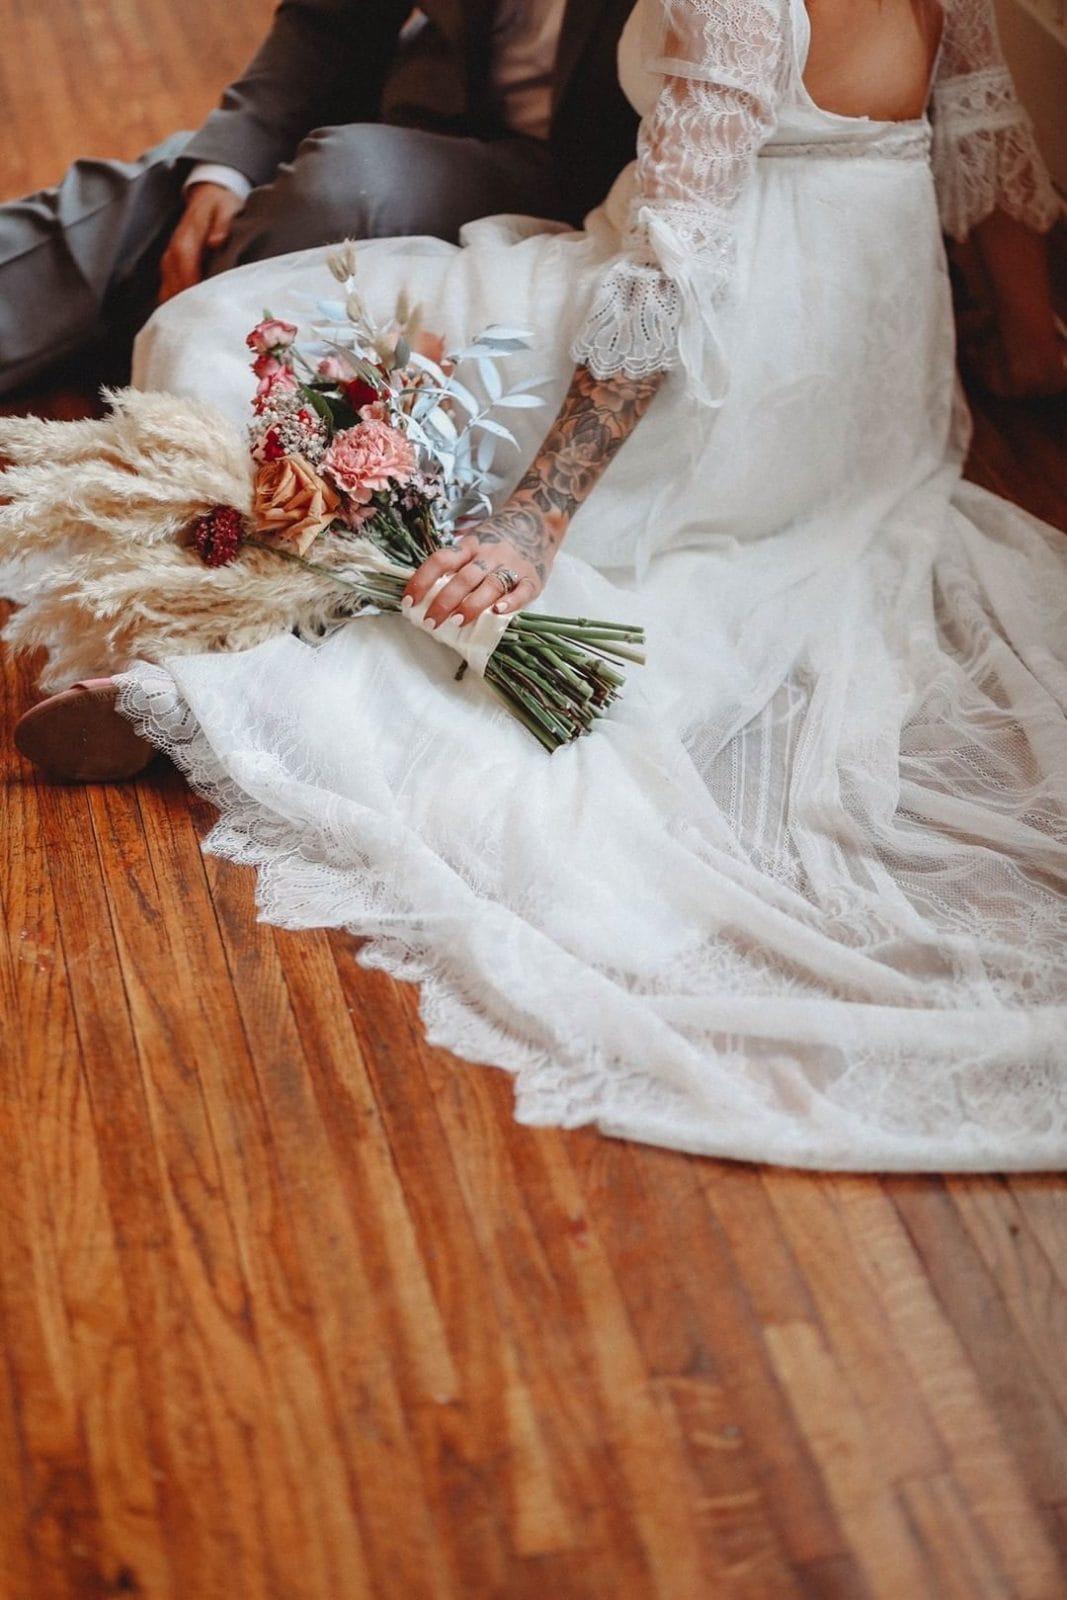 bride and groom sitting on floor